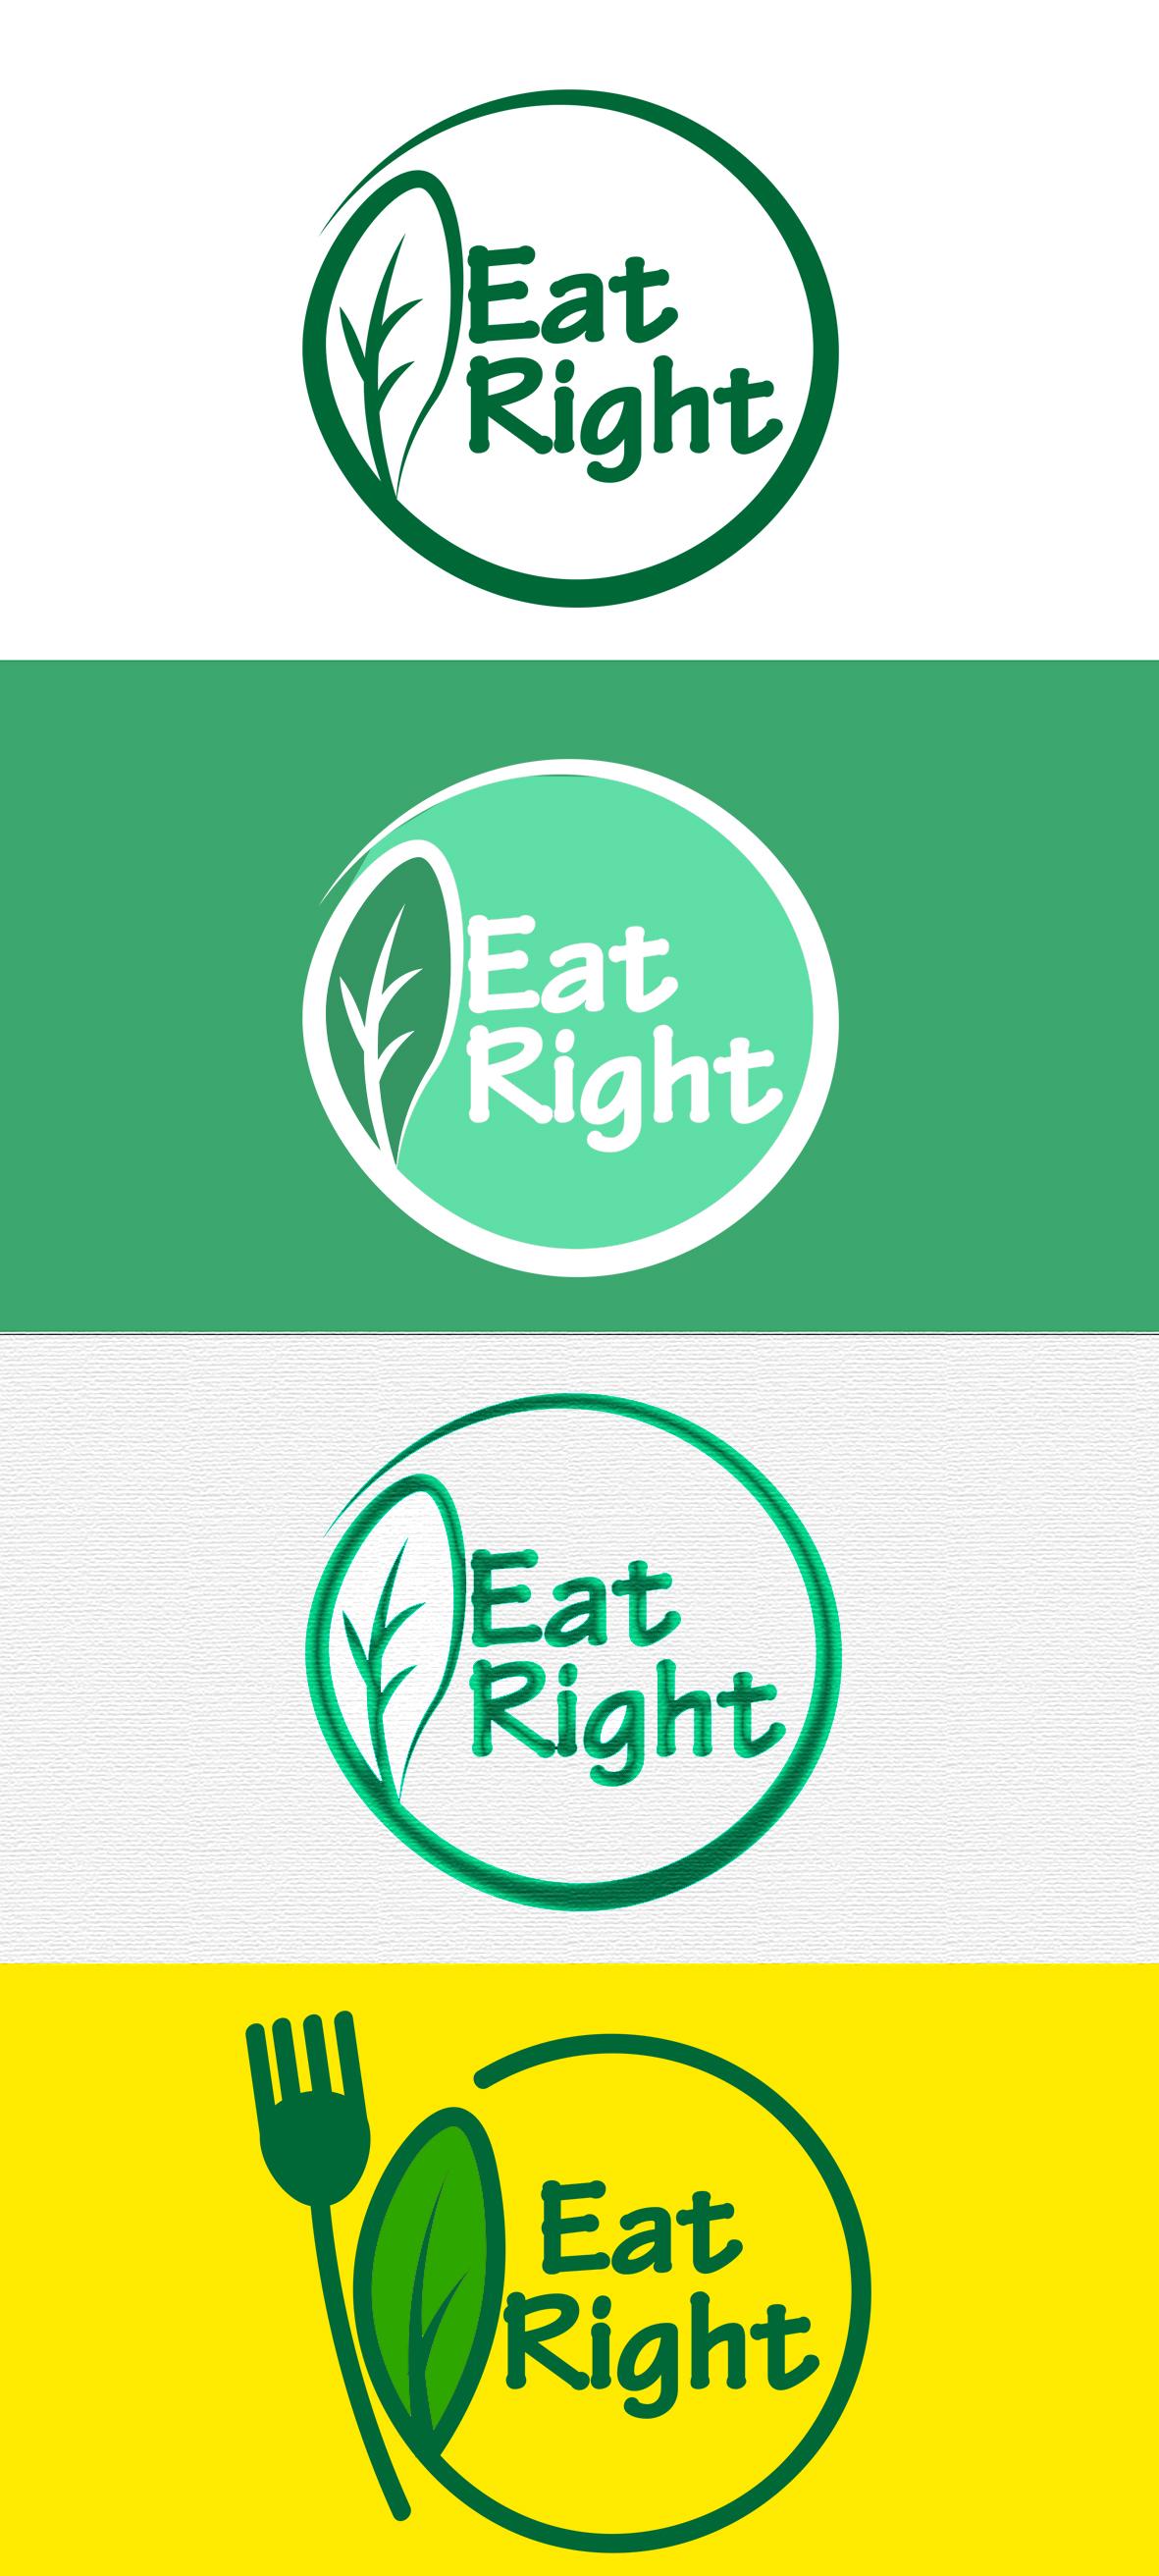 Дизайн логотипа, новое название фото f_5755b0145f2bc55b.jpg